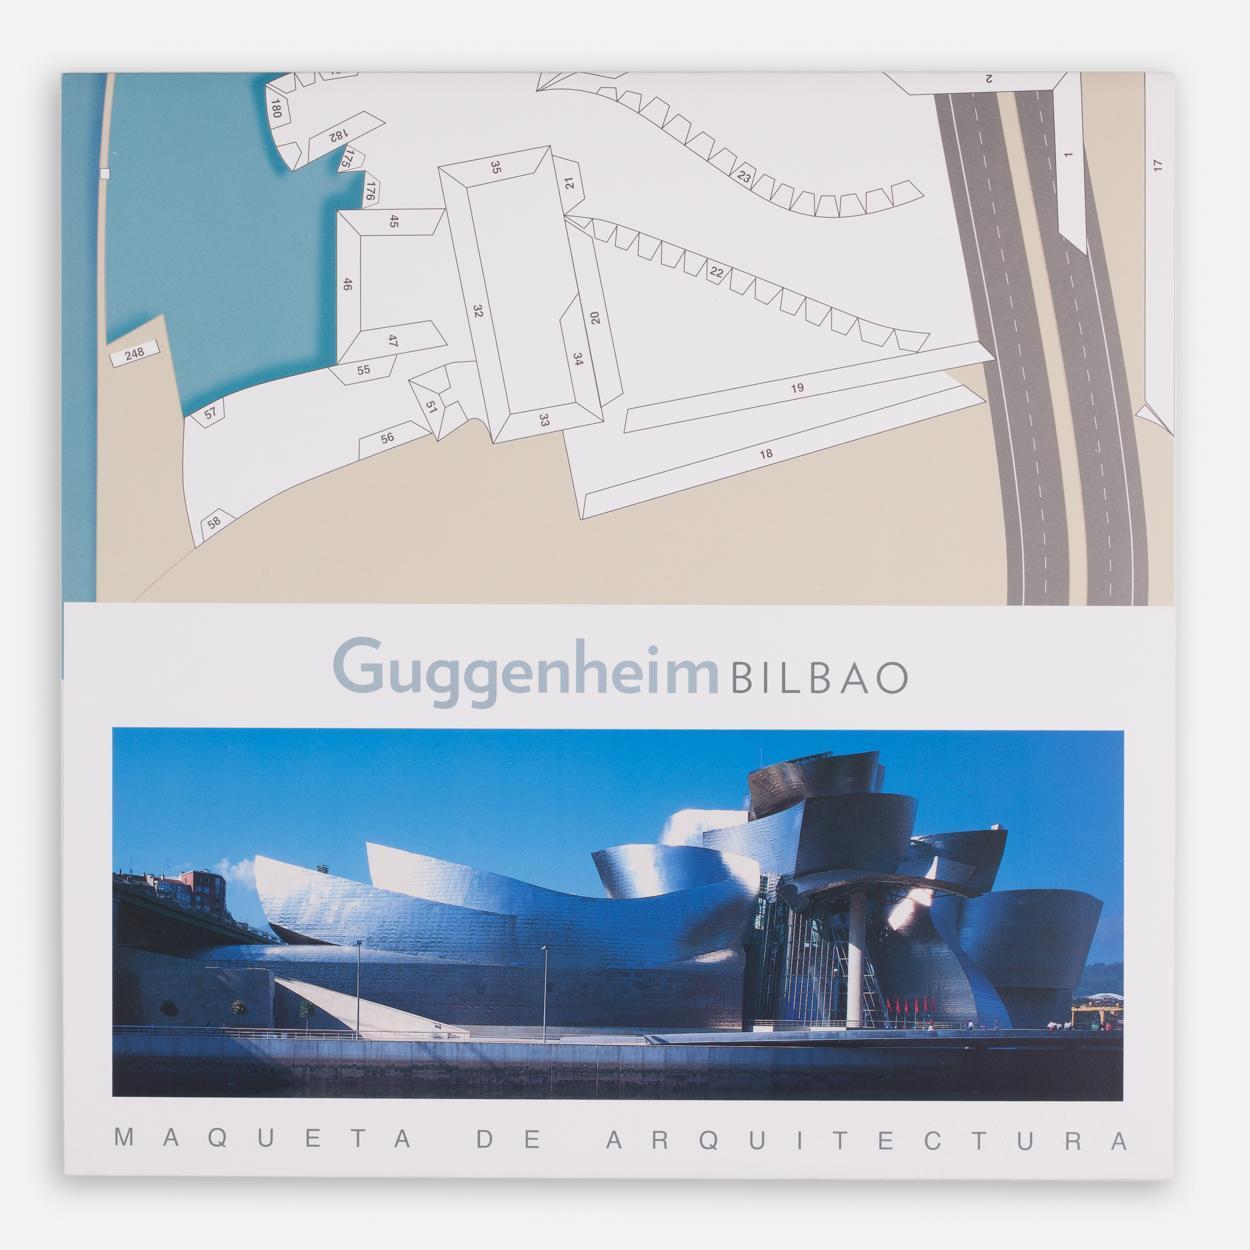 Model Guggenheim Bilbao building